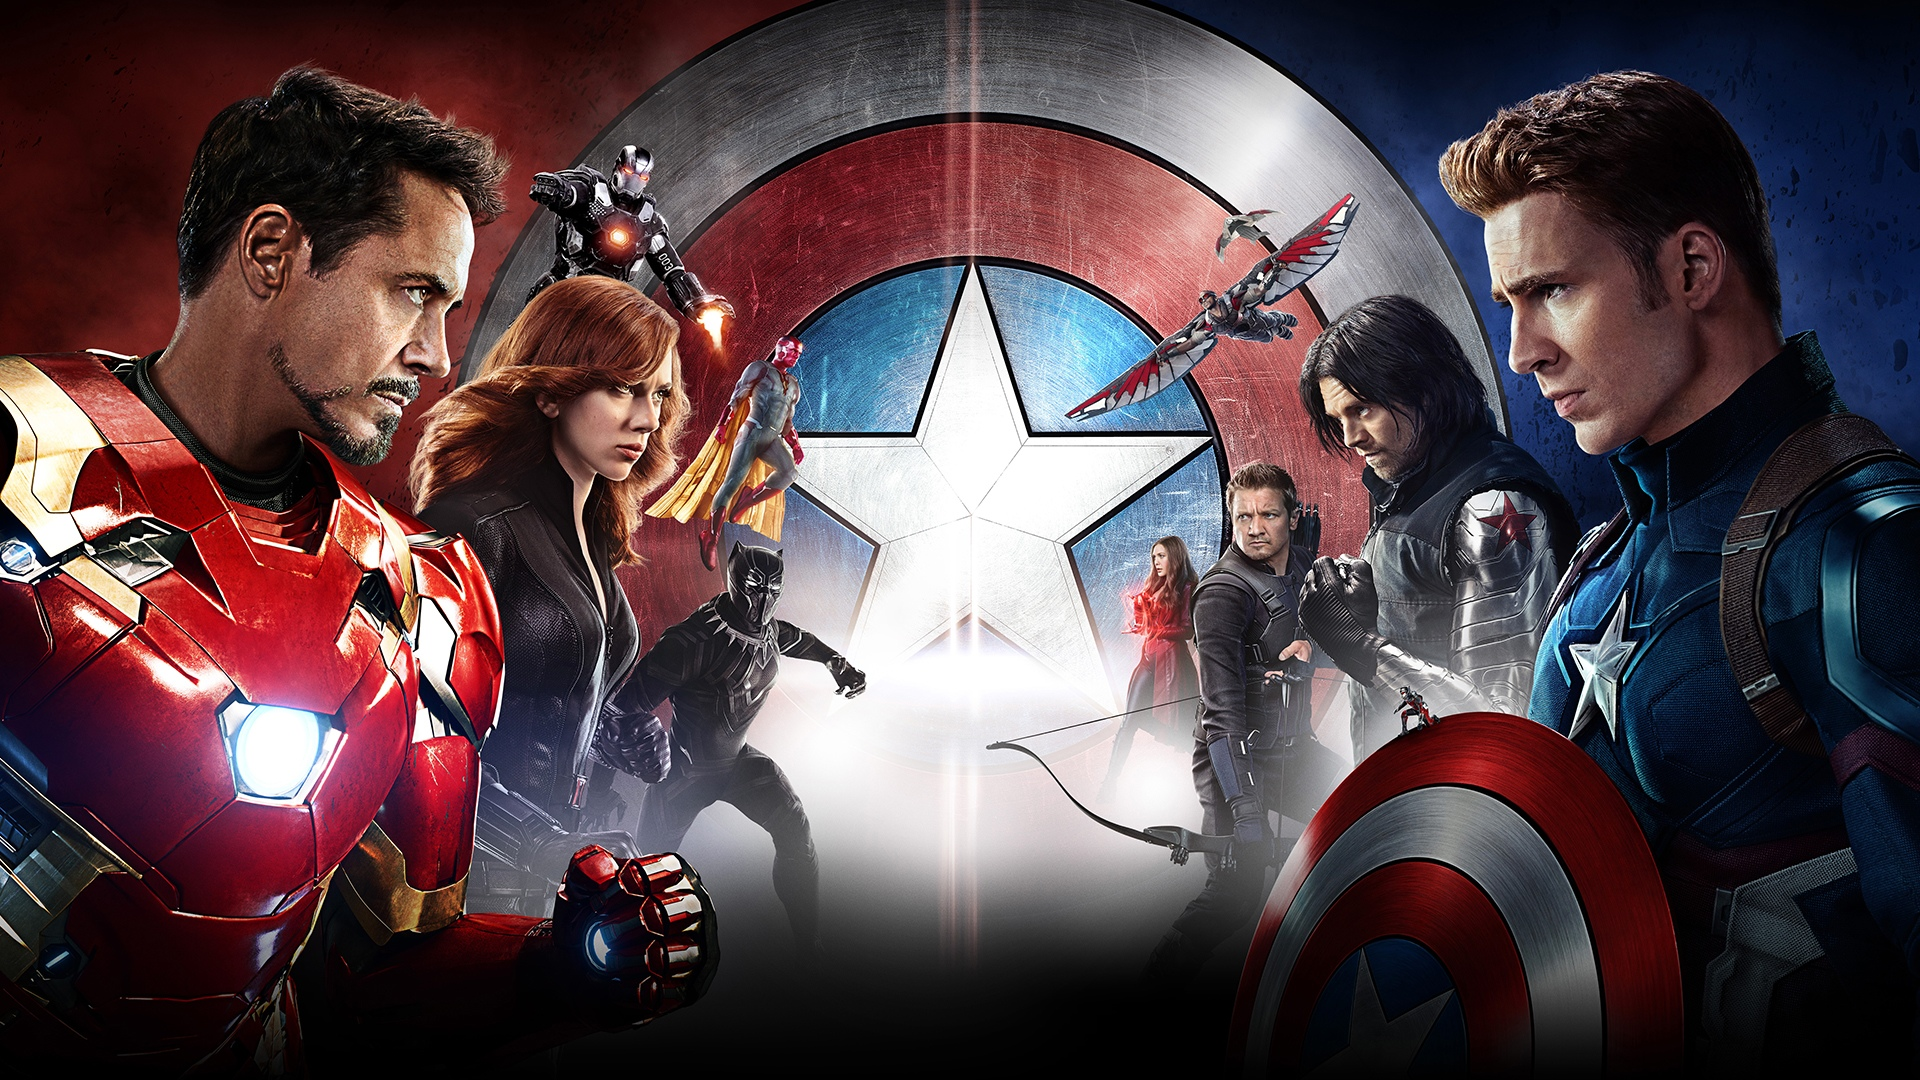 Iron Man Vision Marvel Comics Chris Evans Jeremy Renner Robert Downey Jr Ant Man Scarlet Witch War M 1920x1080